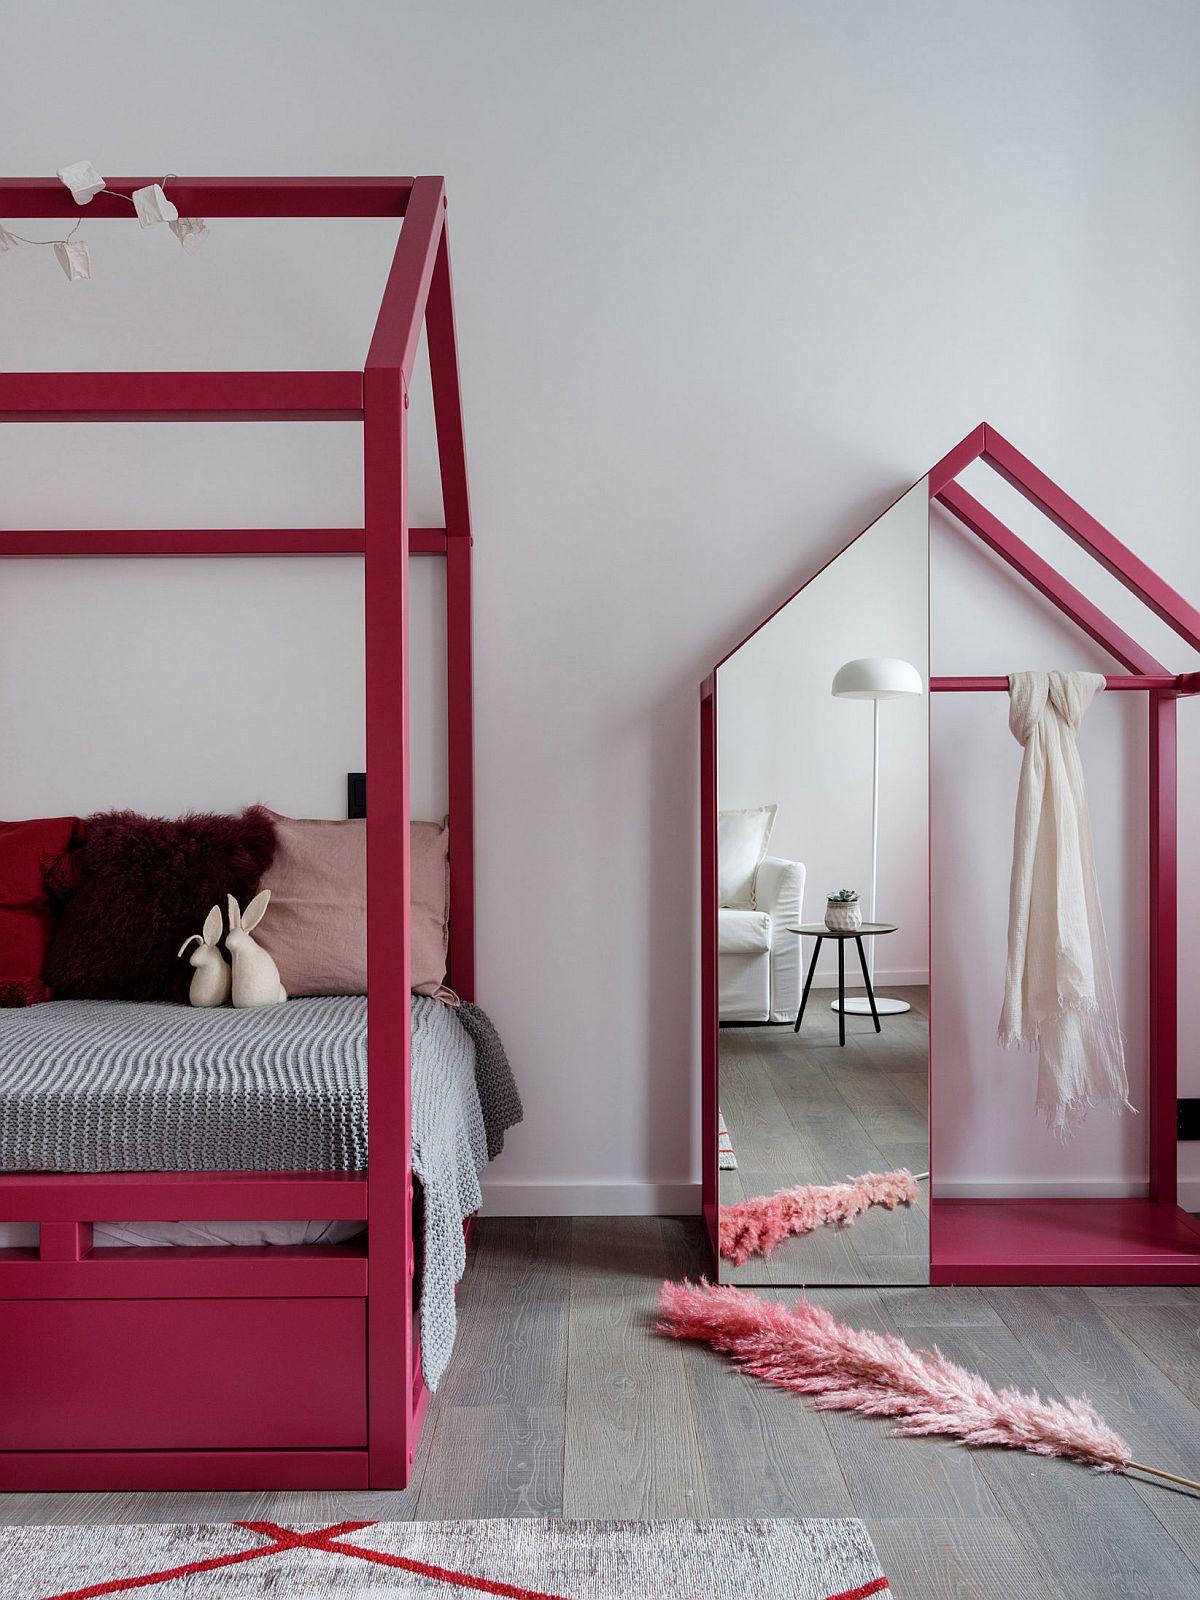 adelaparvu.com despre apartament 90 mp, design Minina Design, Foto Mikhail Loskutov (1)